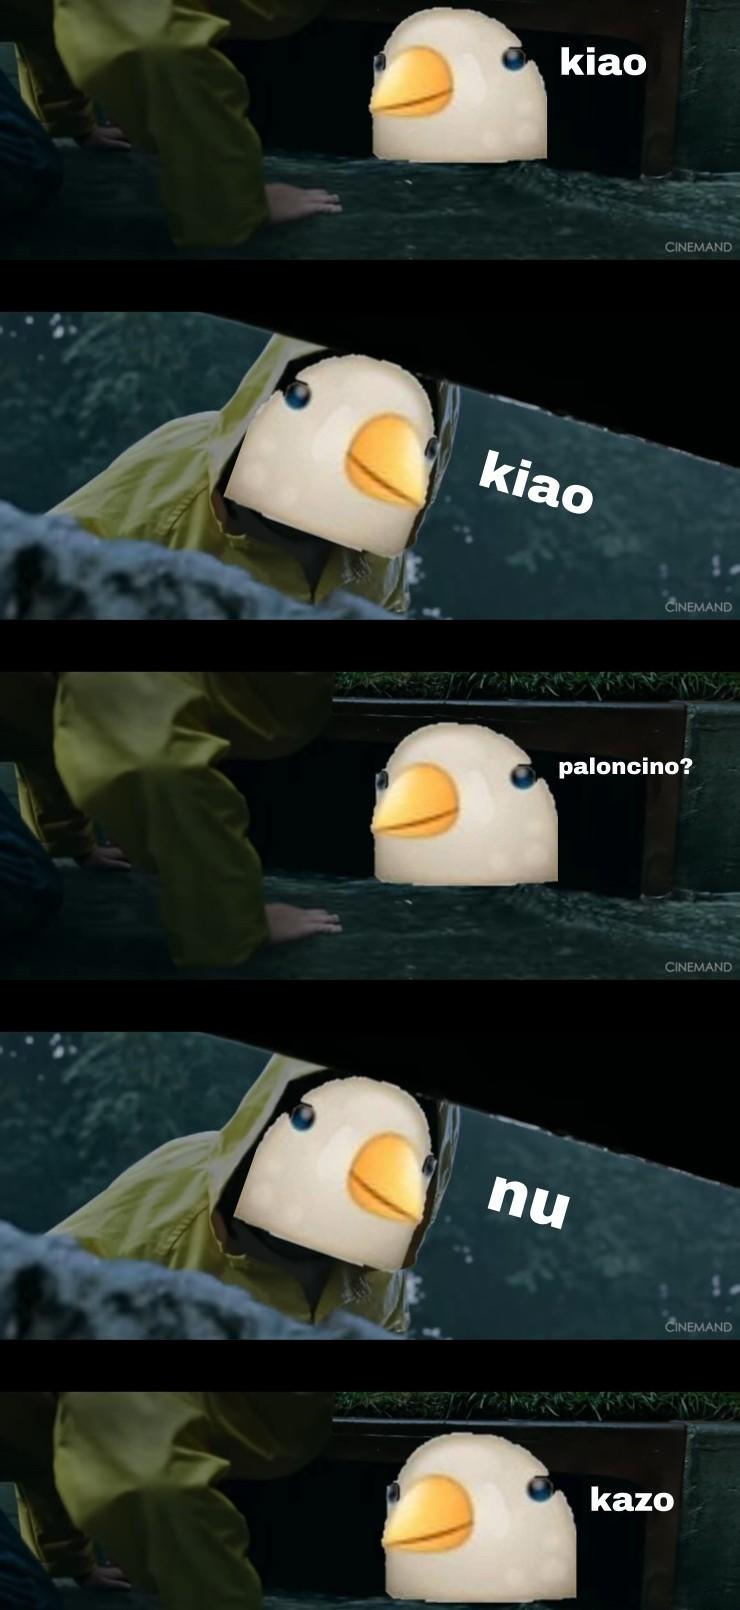 Tropo lunko - meme